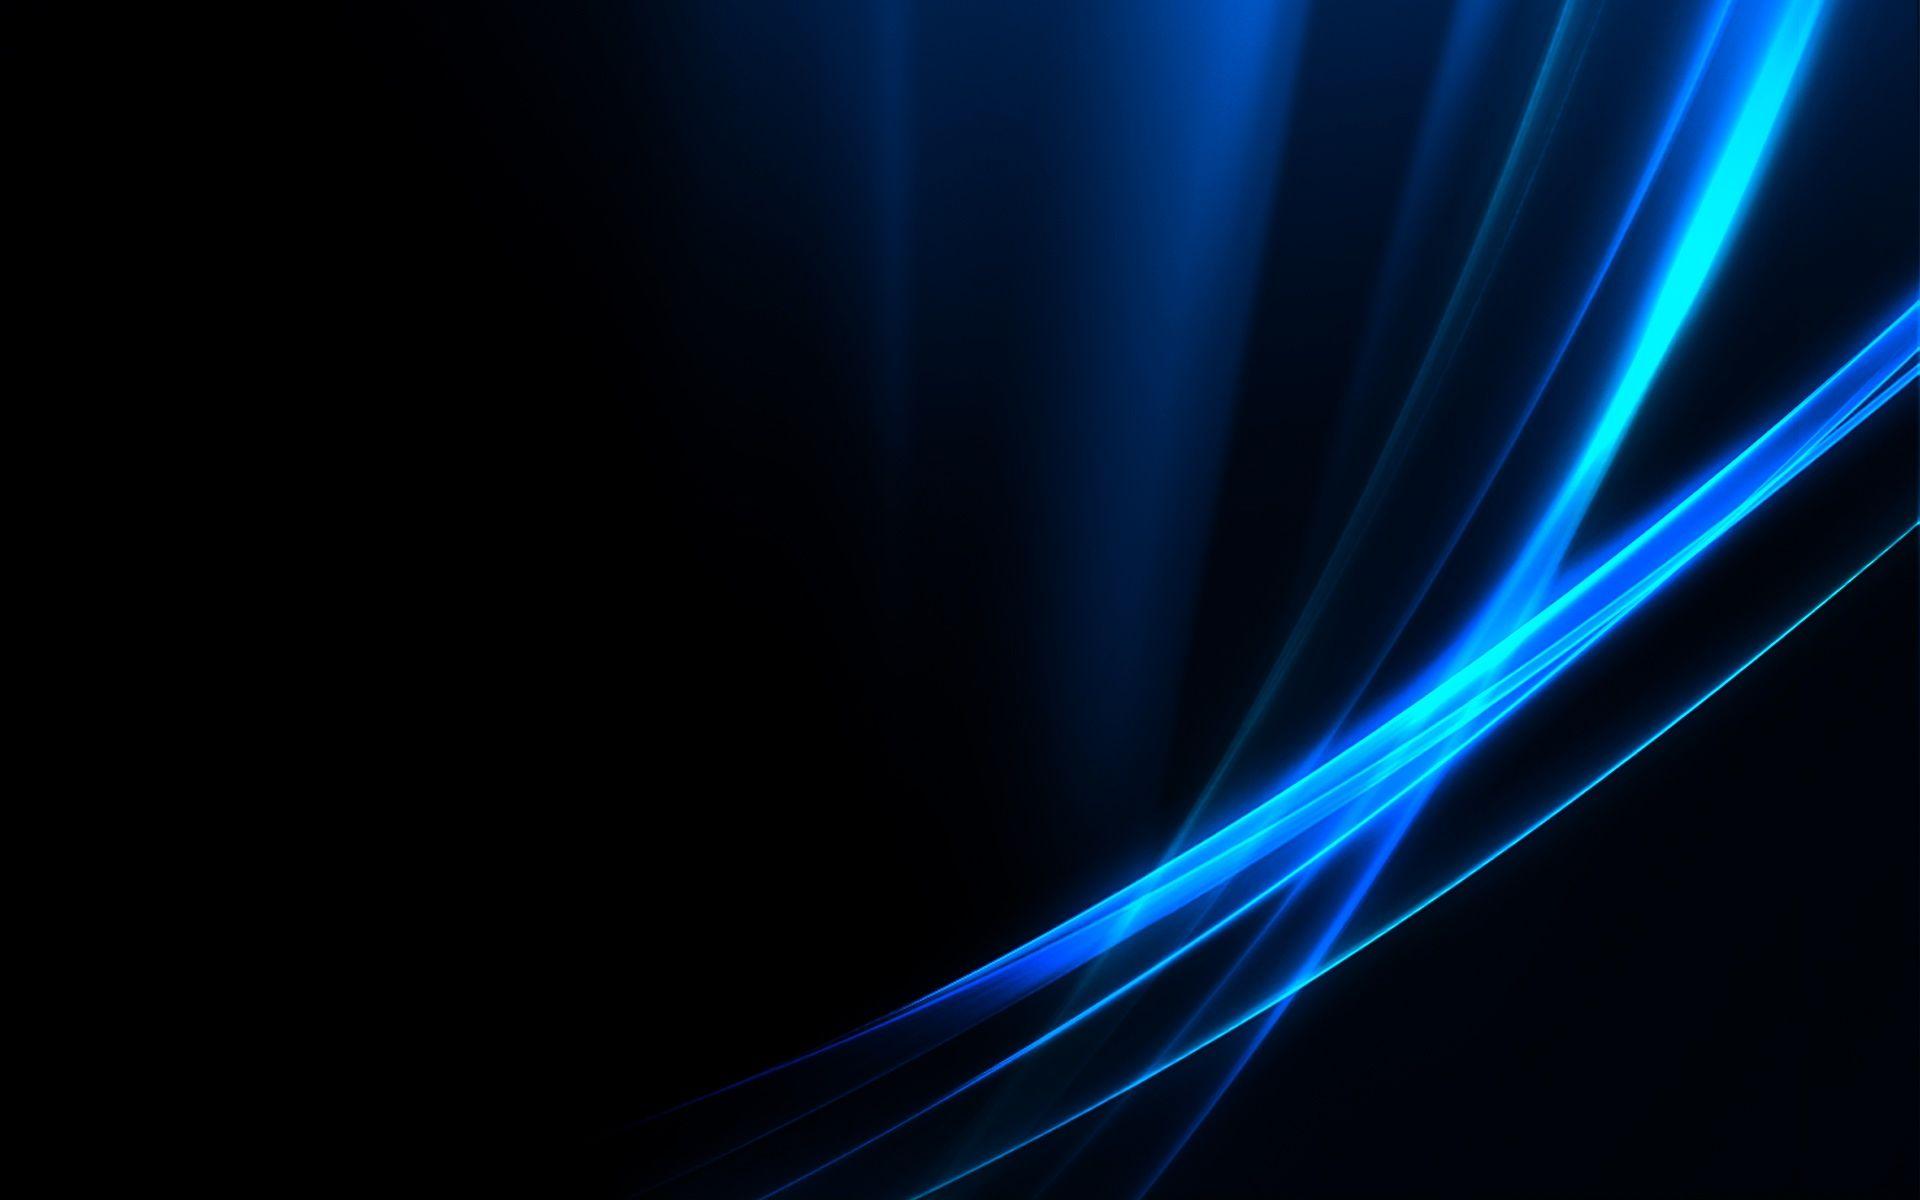 1569474 Jpg 1 920 1 200 Pixels Black And Blue Wallpaper Waves Wallpaper Digital Wallpaper